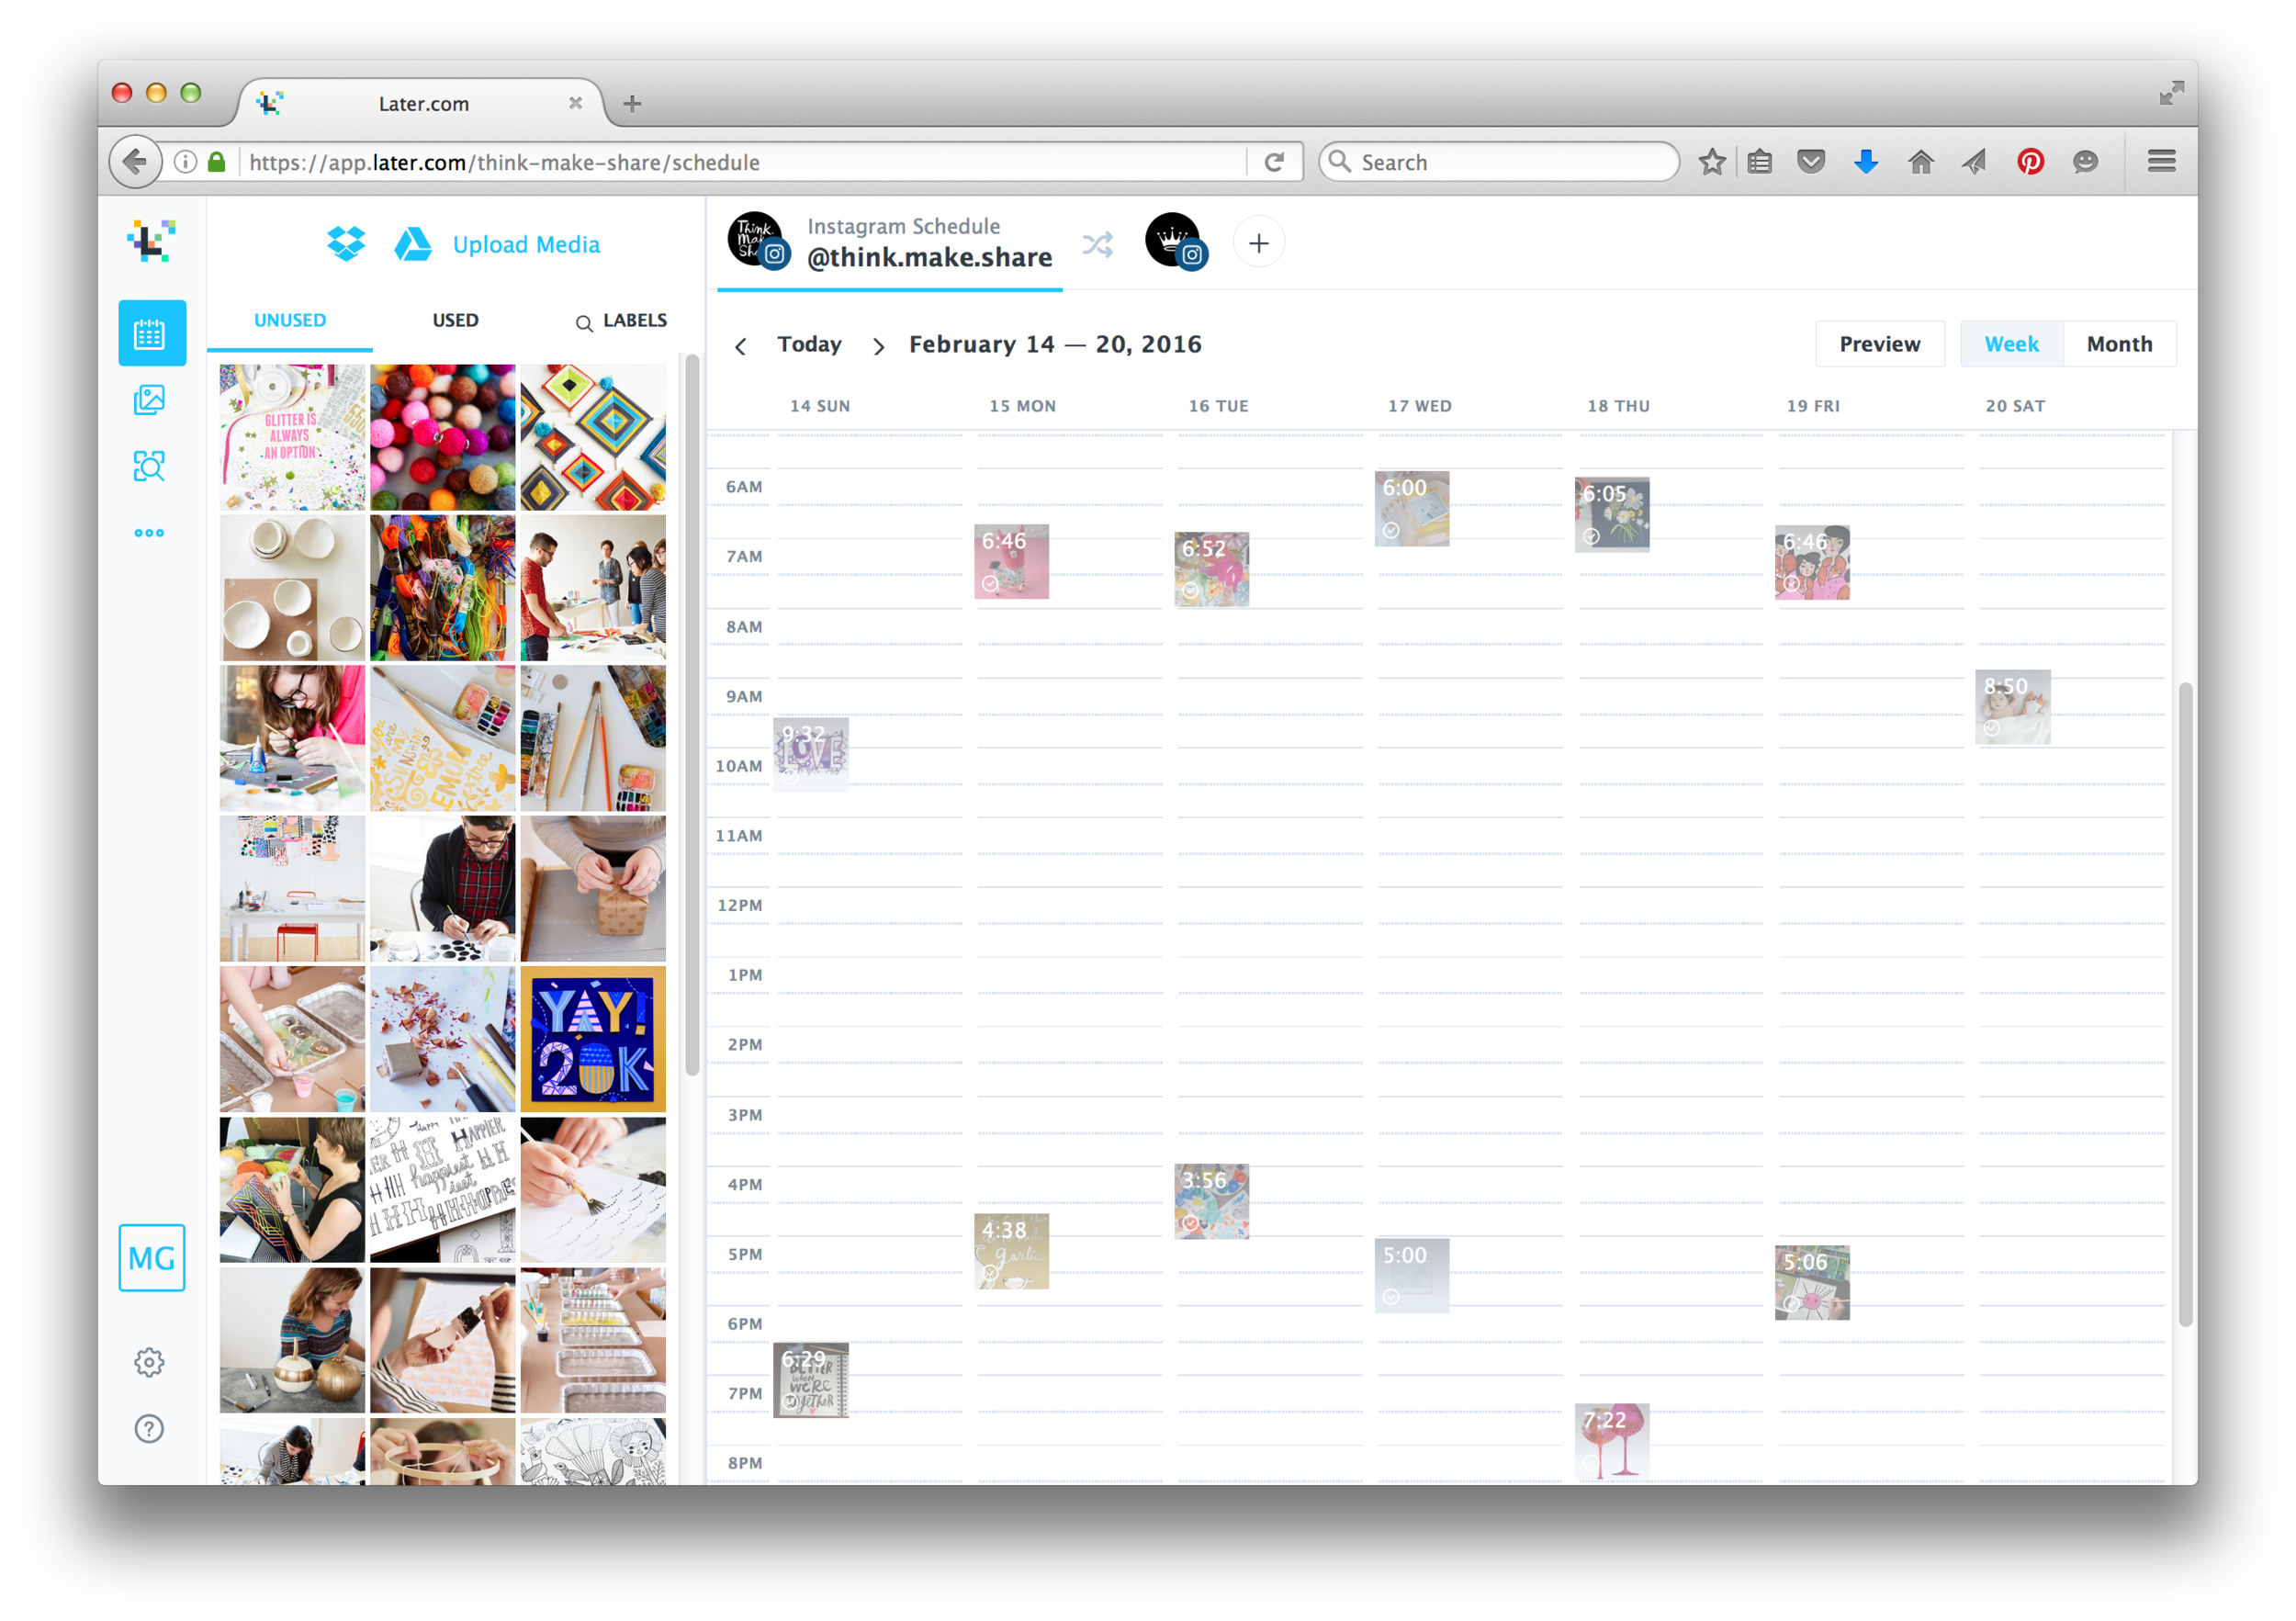 Later.com : Content Calendar Planning Tool